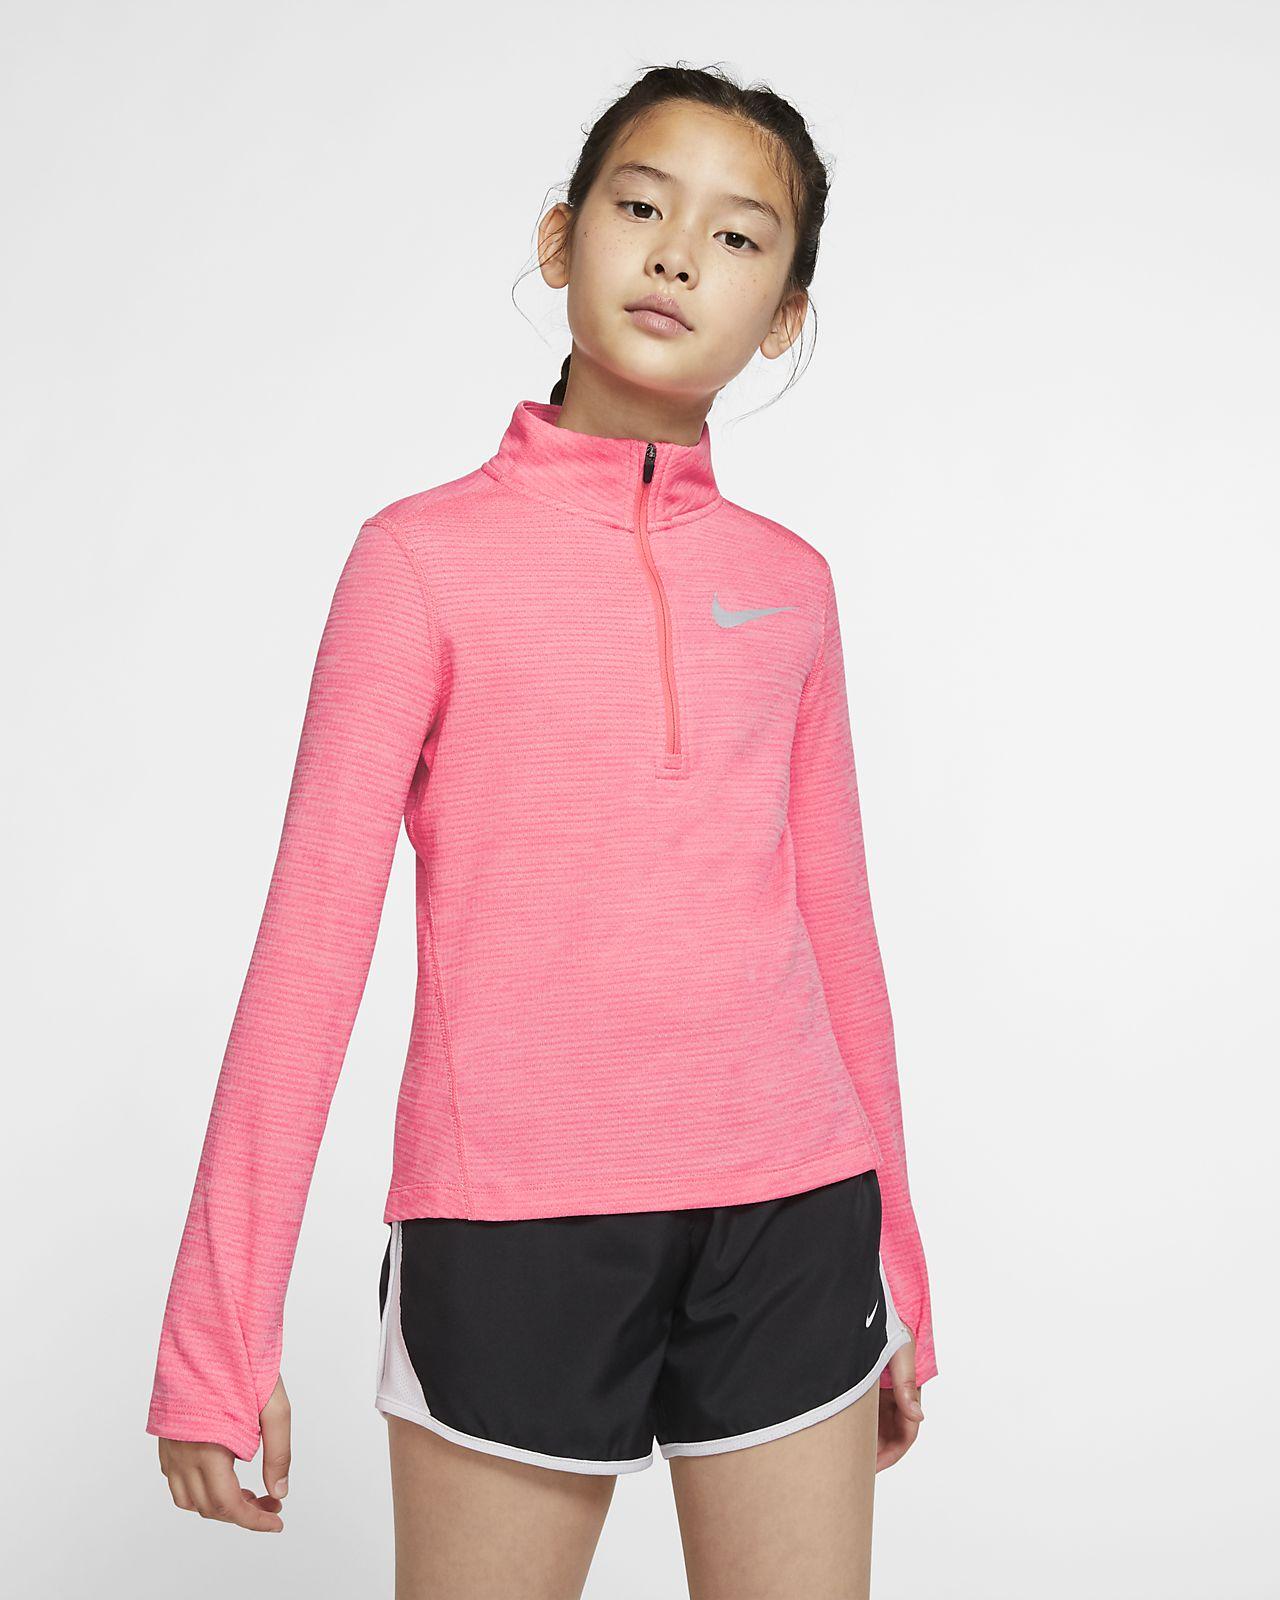 Maglia da running a manica lunga con zip a metà lunghezza Nike - Ragazza